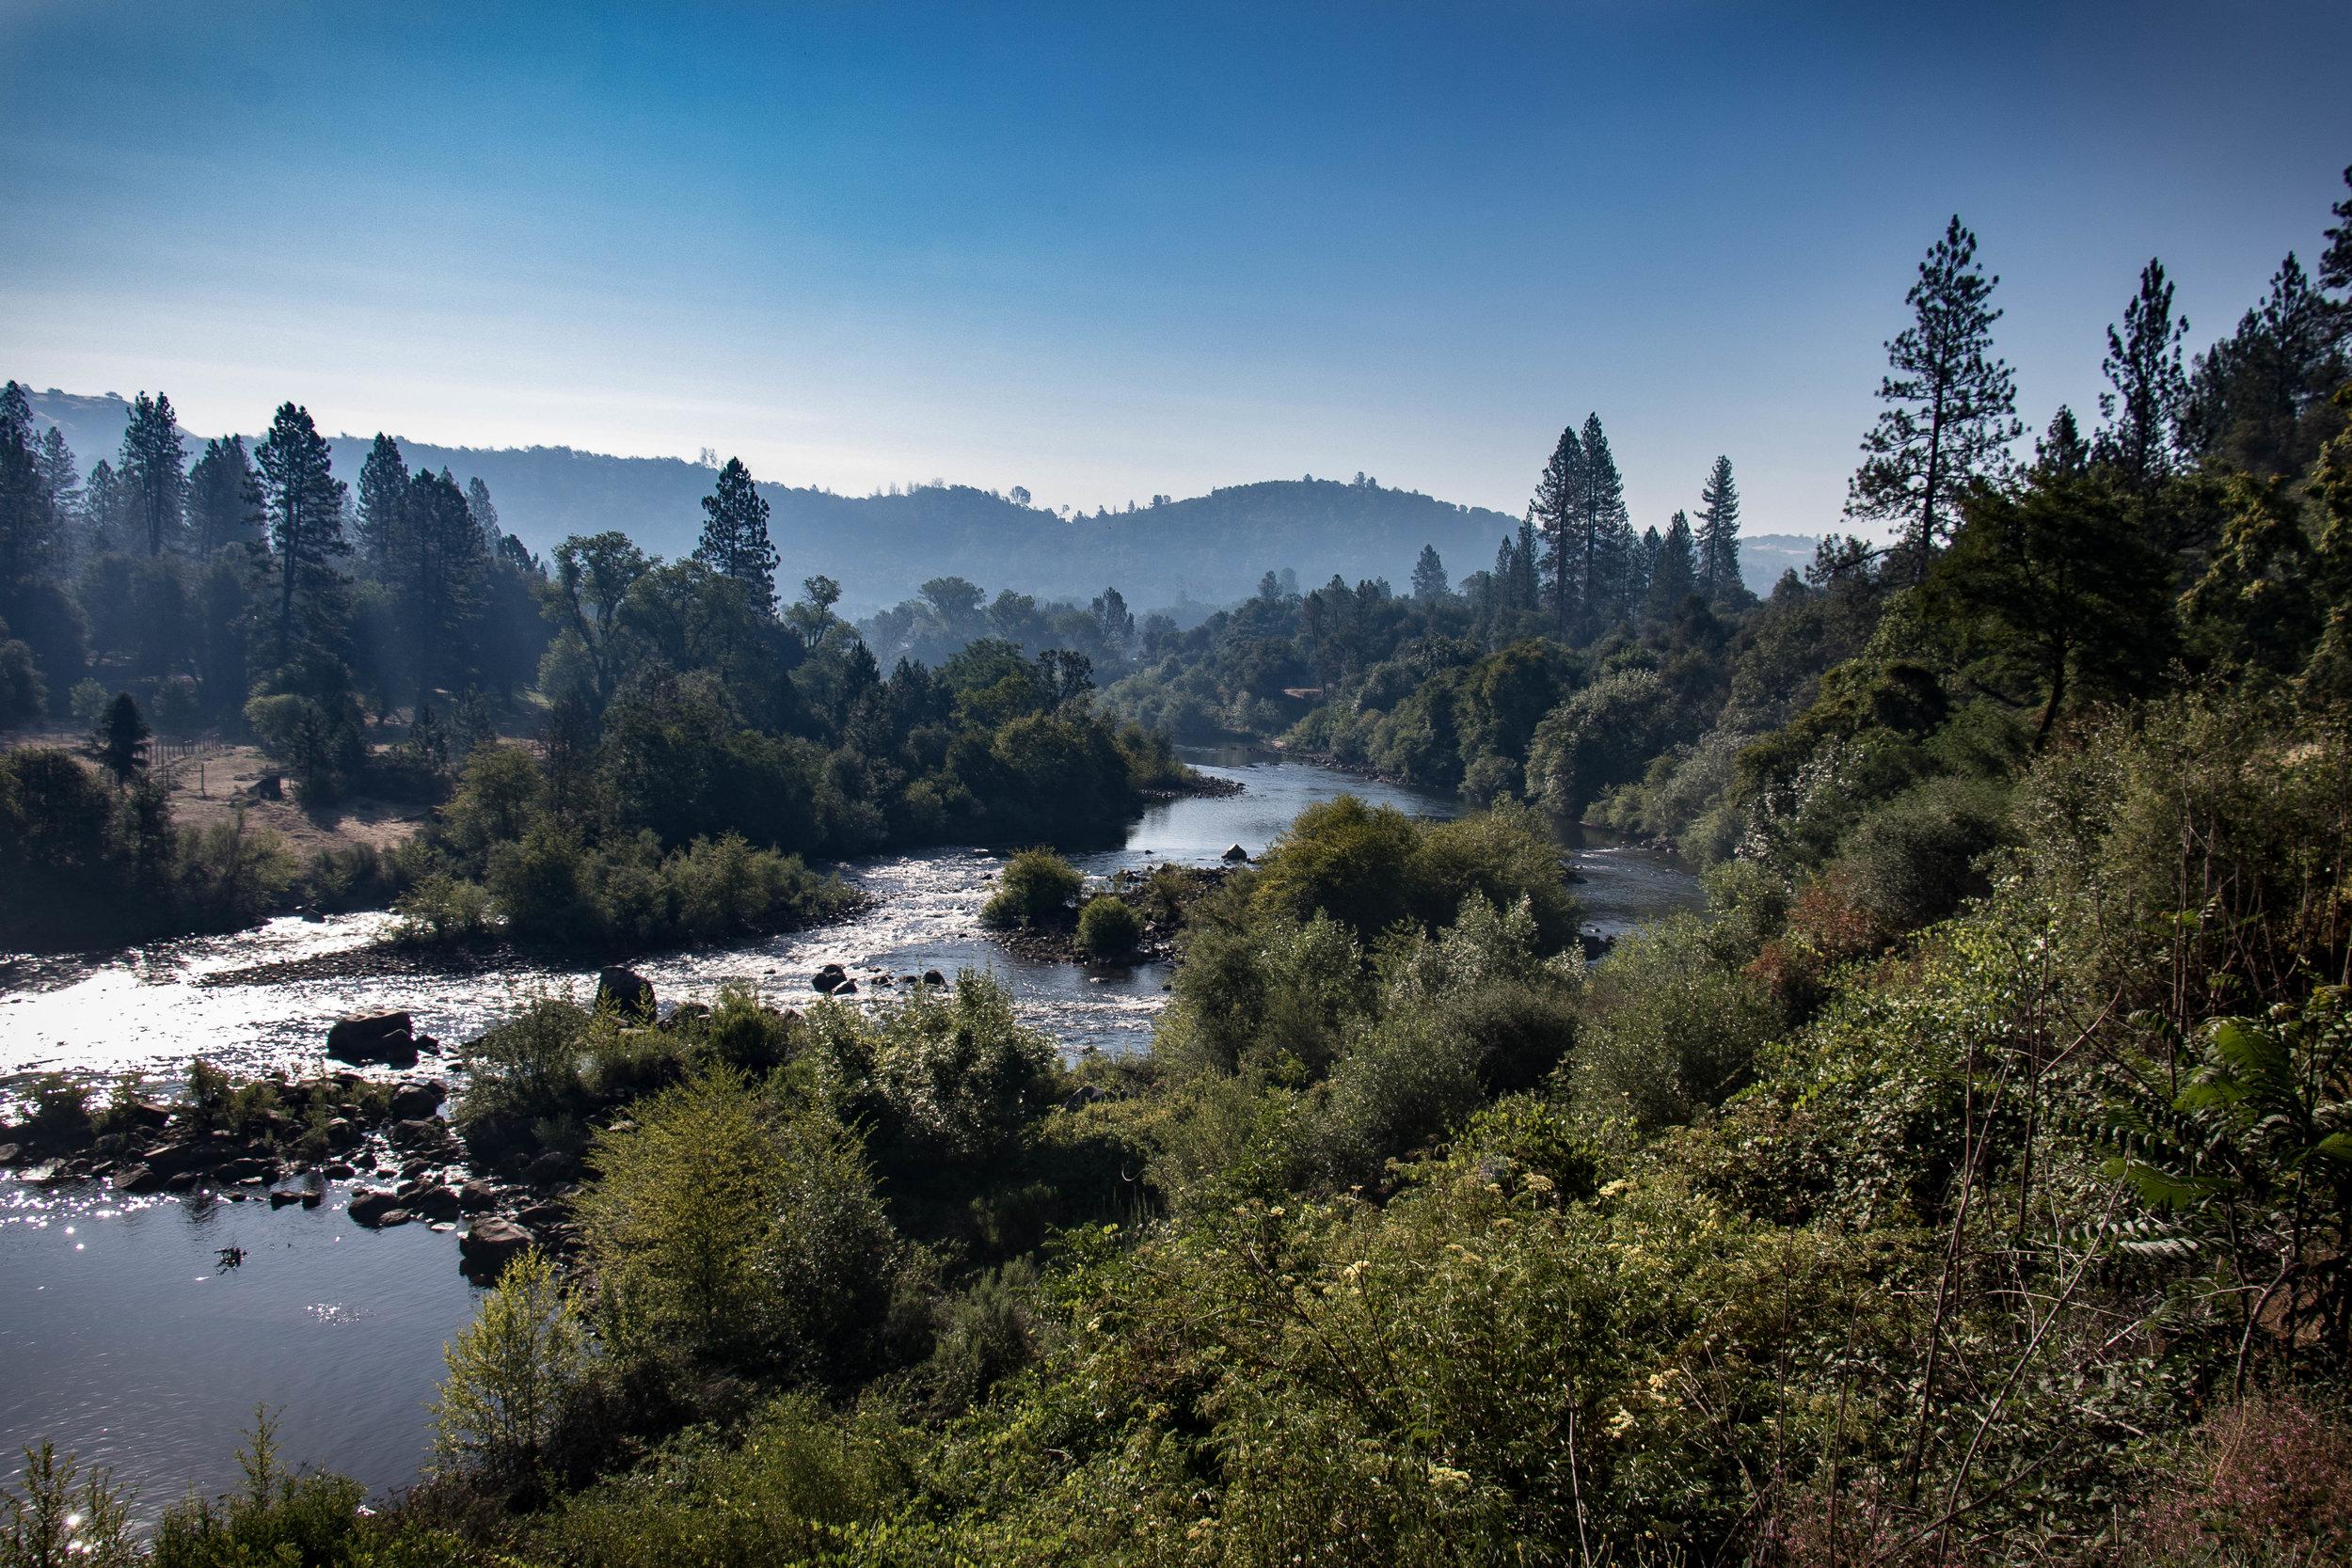 American River Scenery